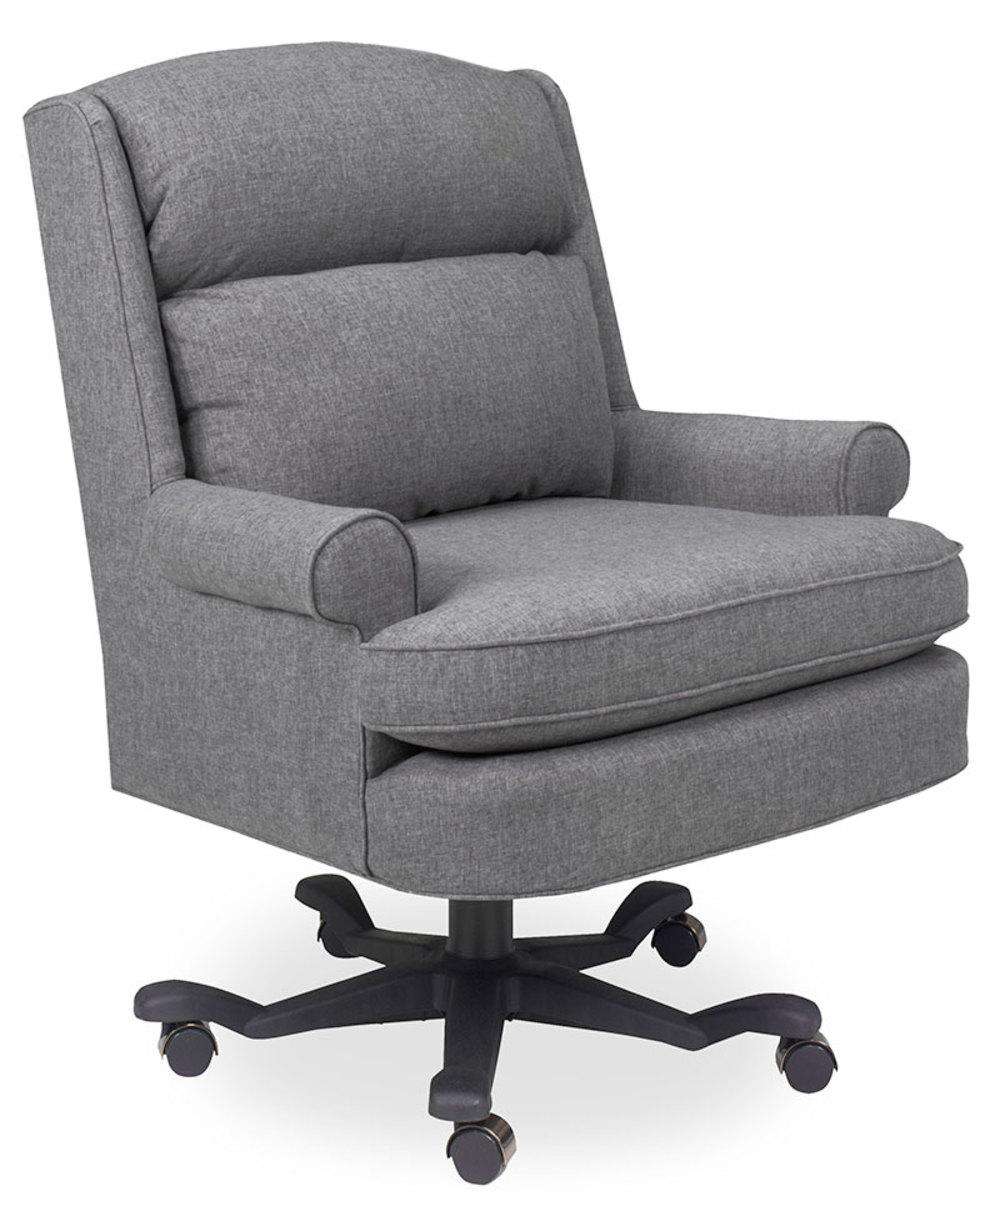 Parker Southern - Lombardi Tilt Swivel Chair